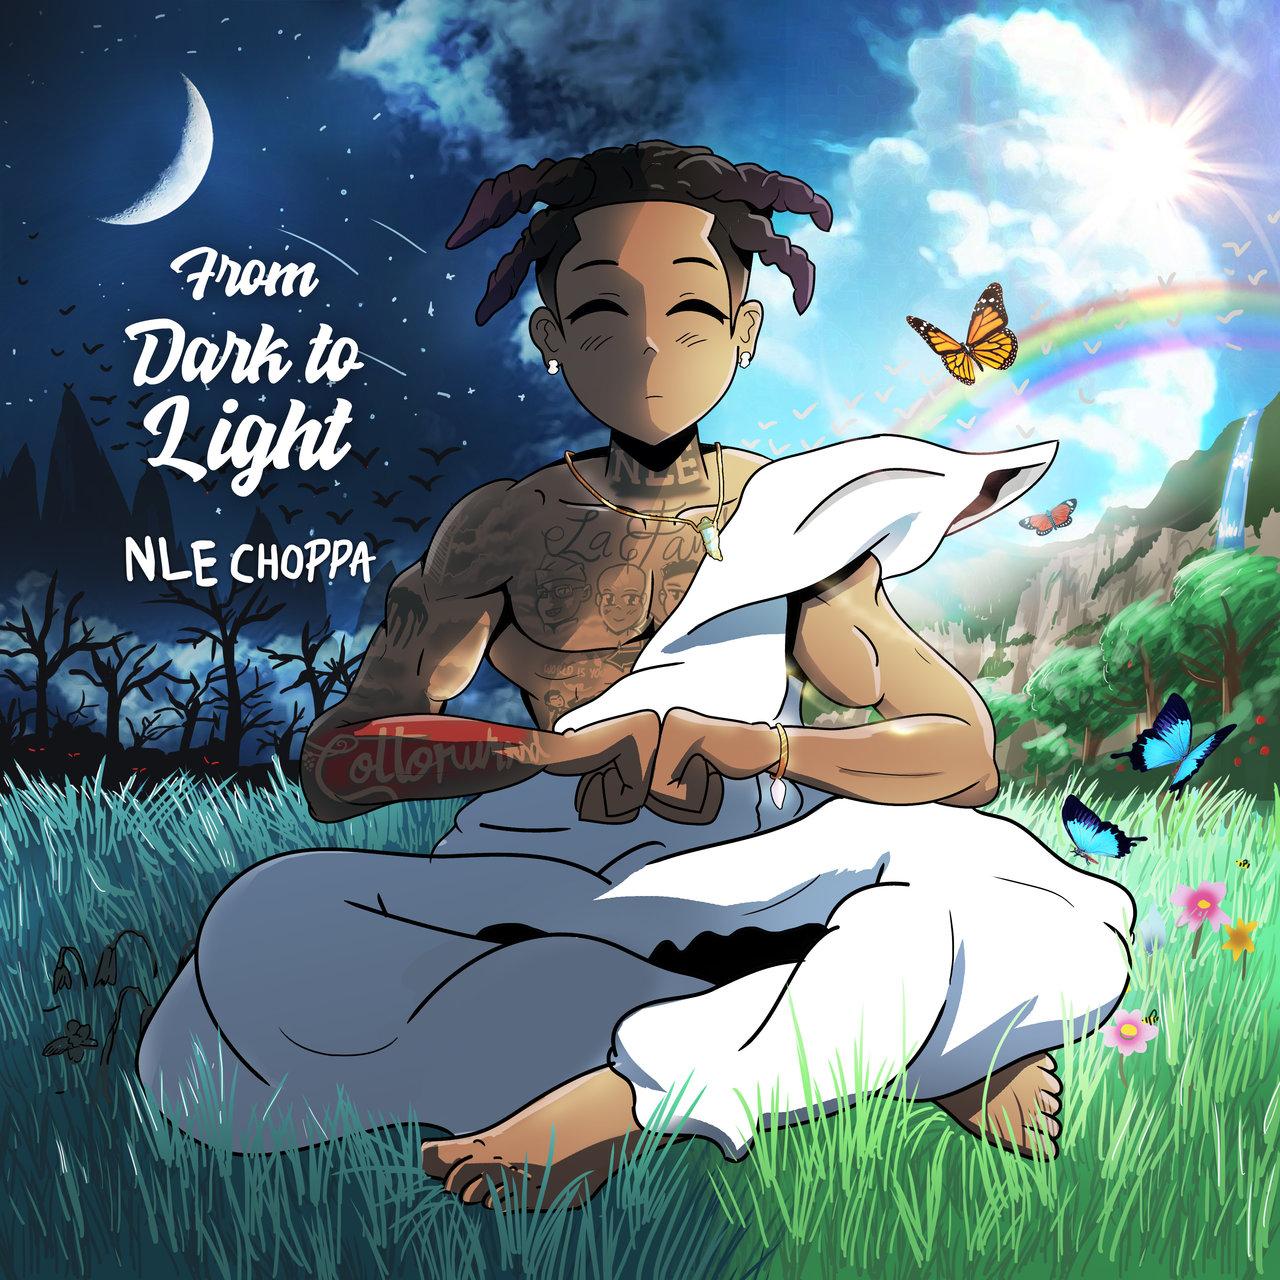 NLE Choppa - From Dark To Light (Cover)